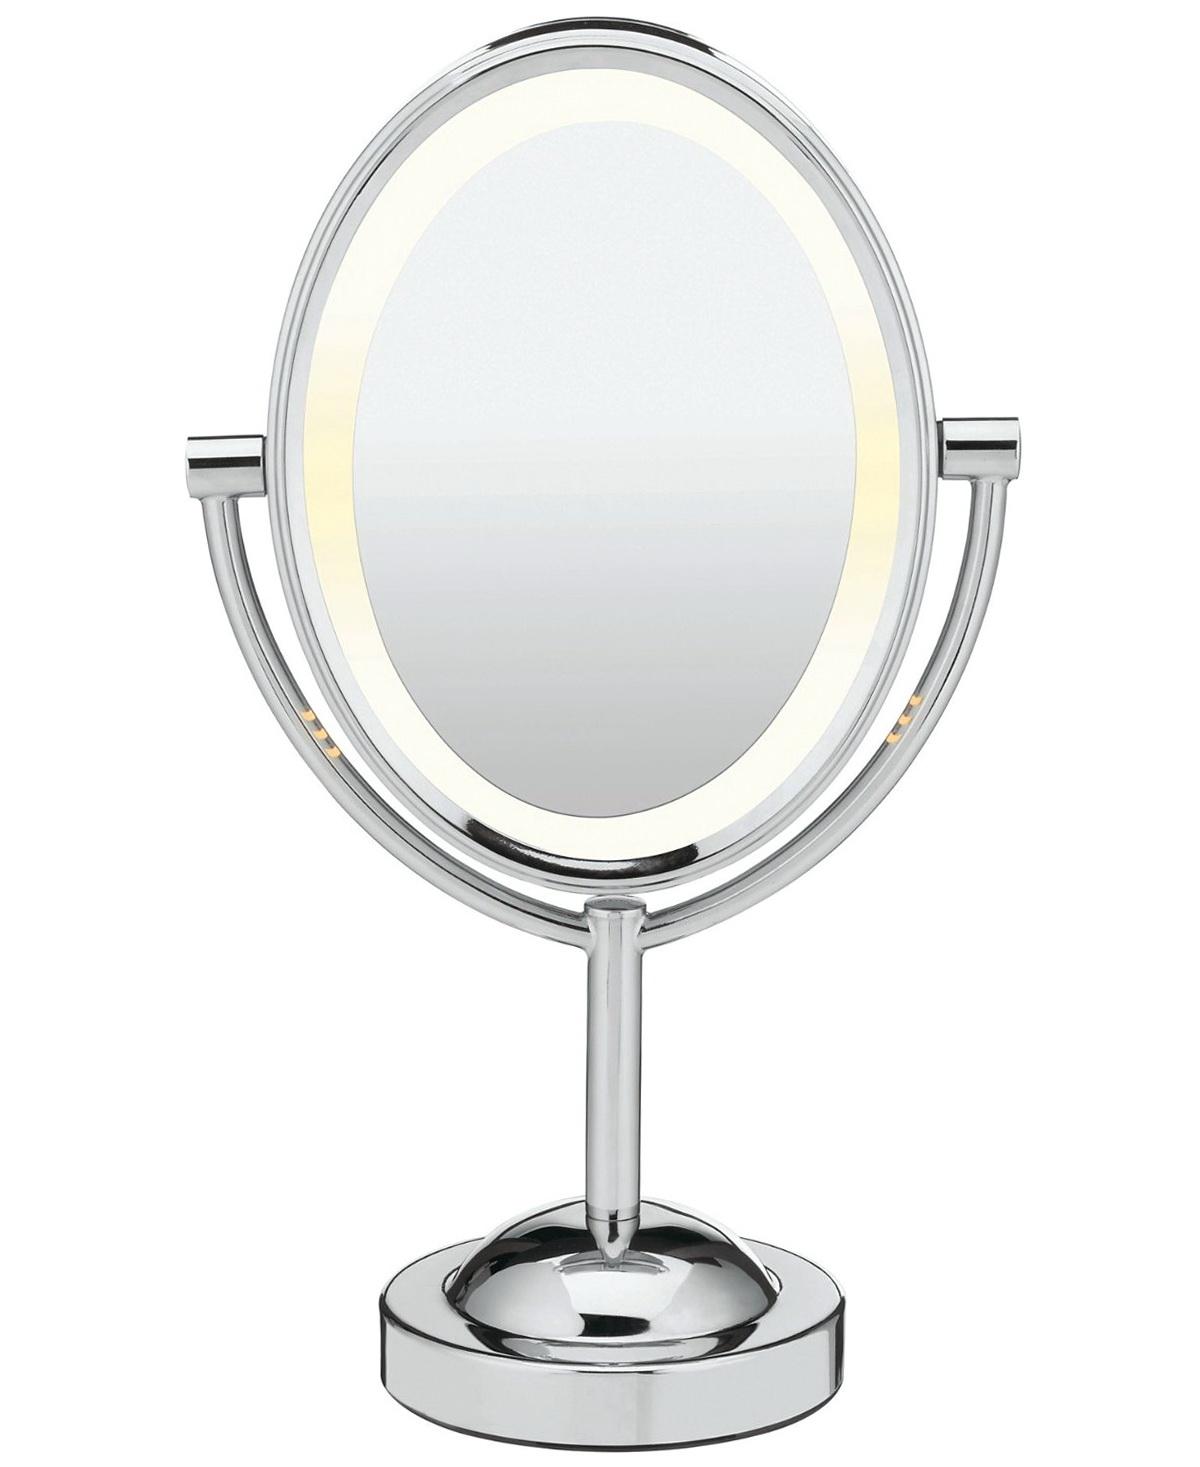 Illuminated Makeup Mirrors